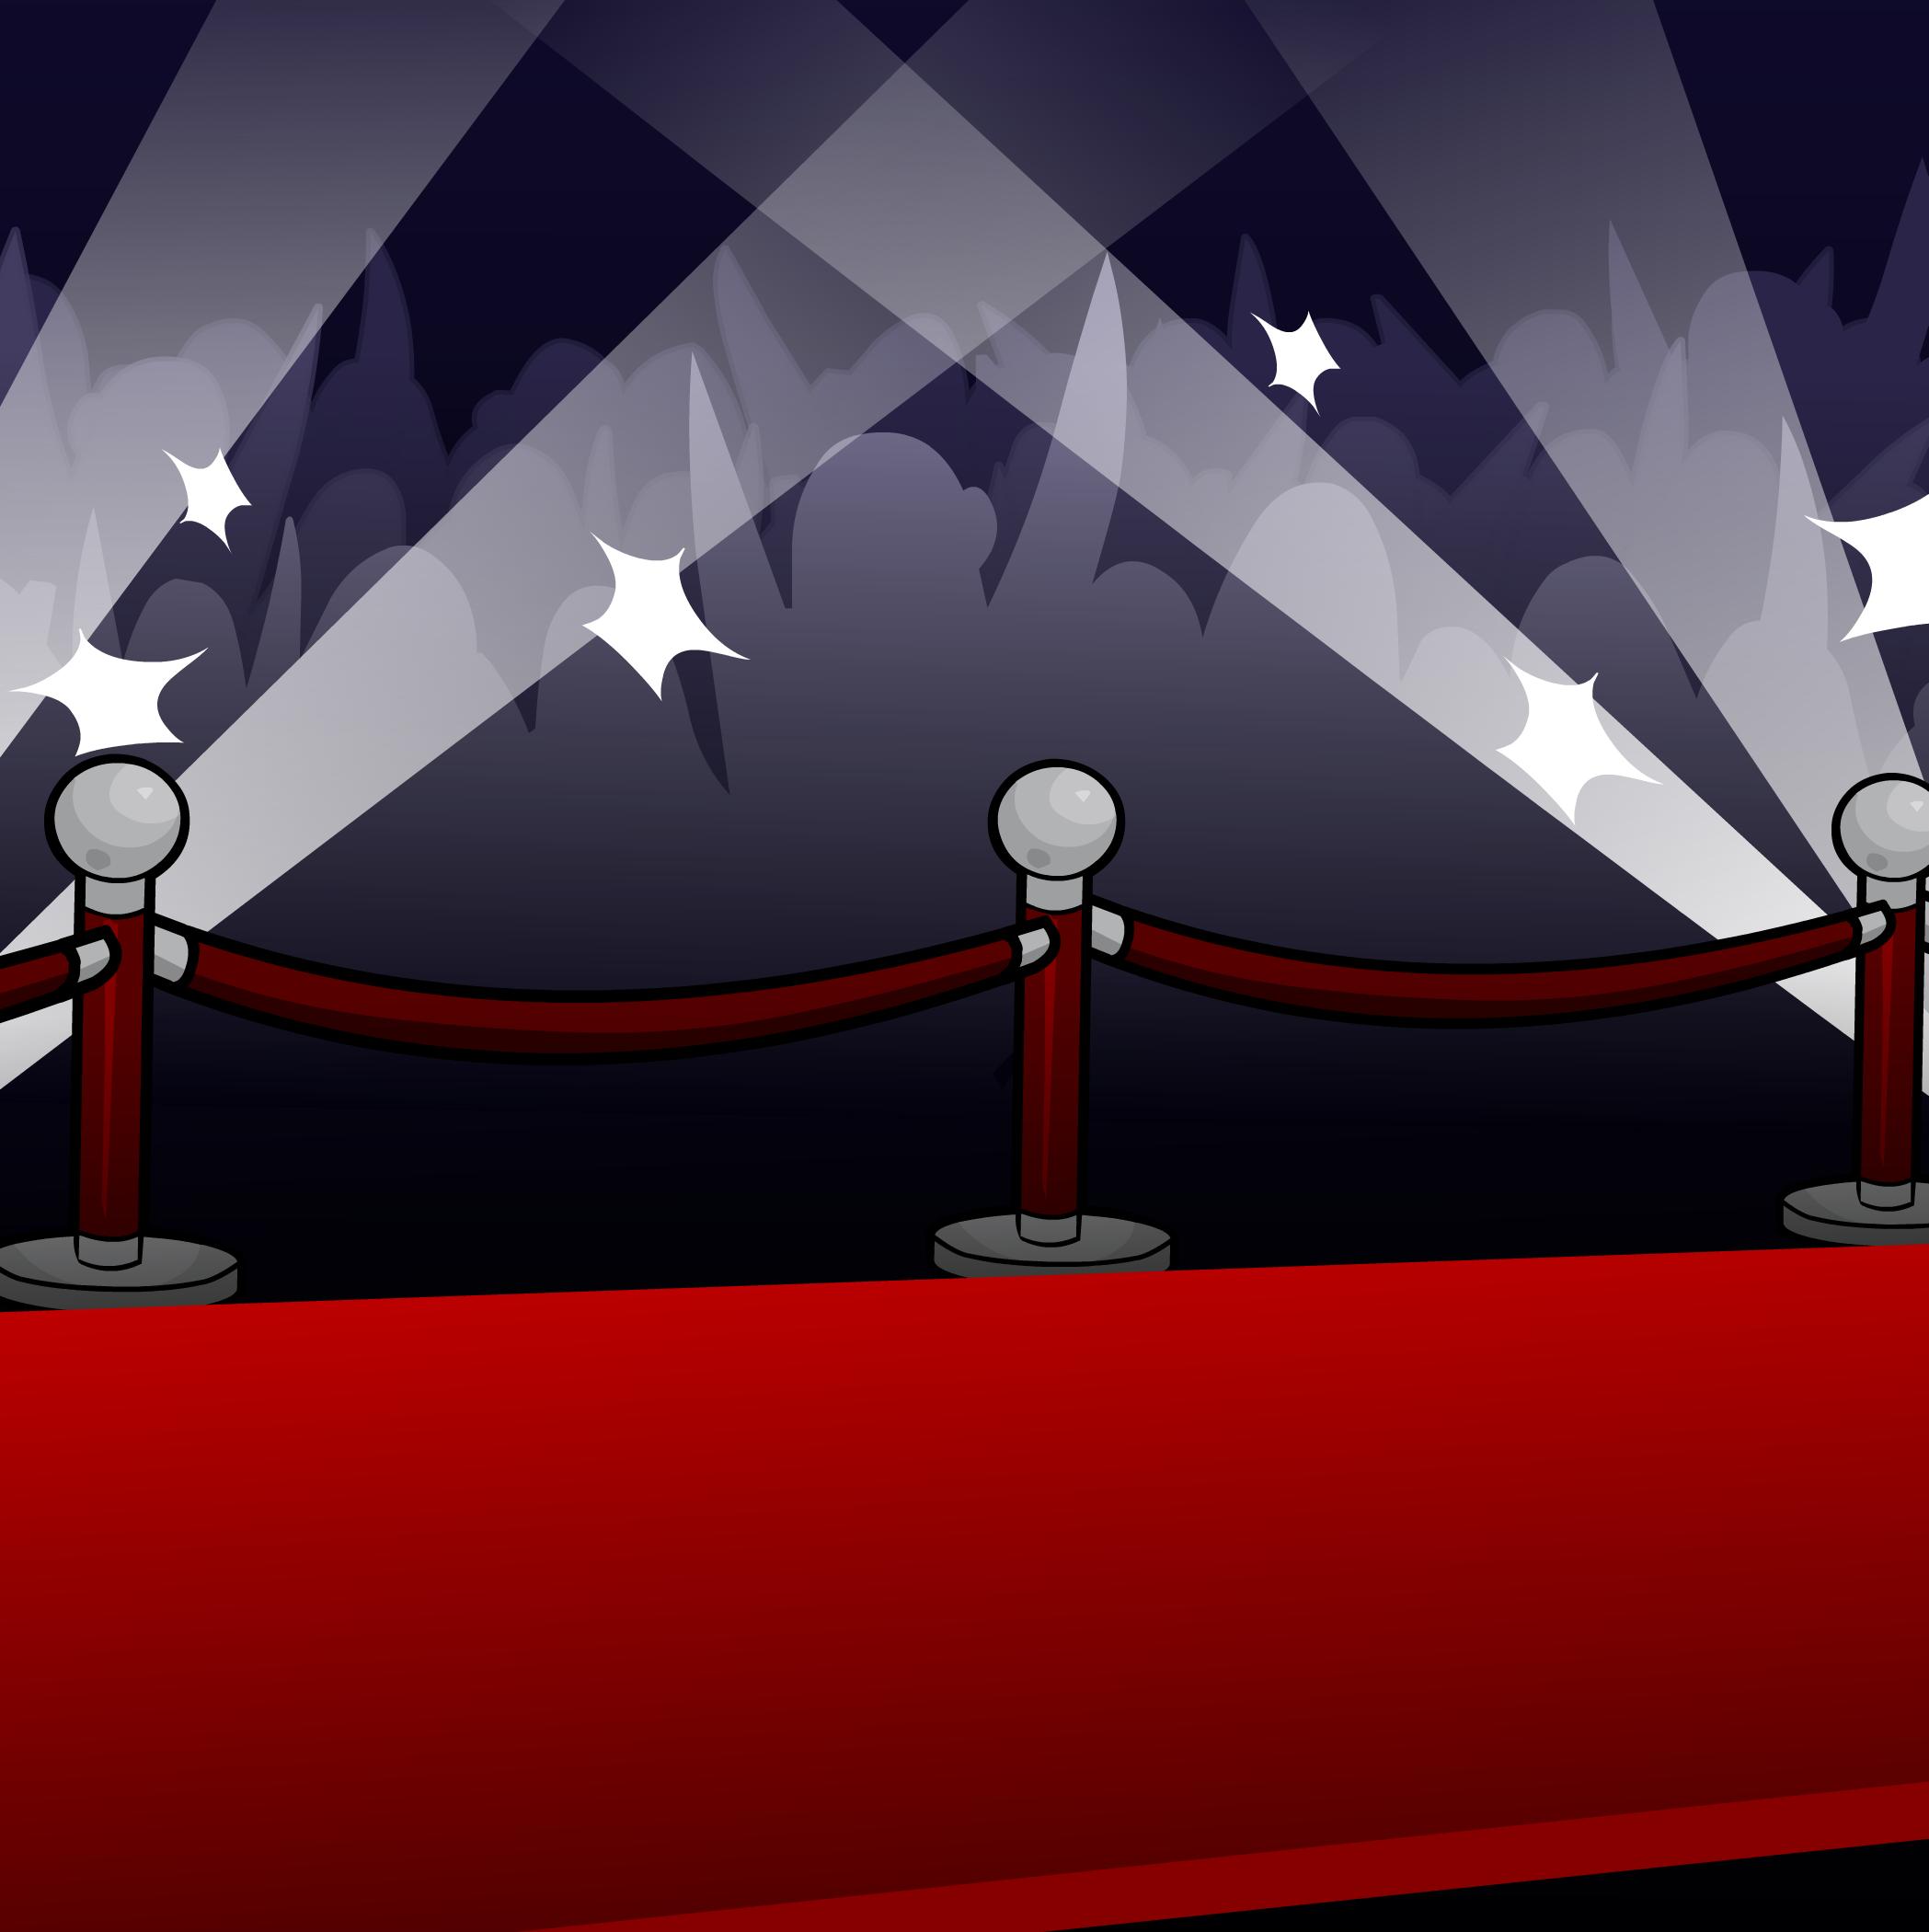 Awards Background - Club Penguin Wiki - The free, editable ...